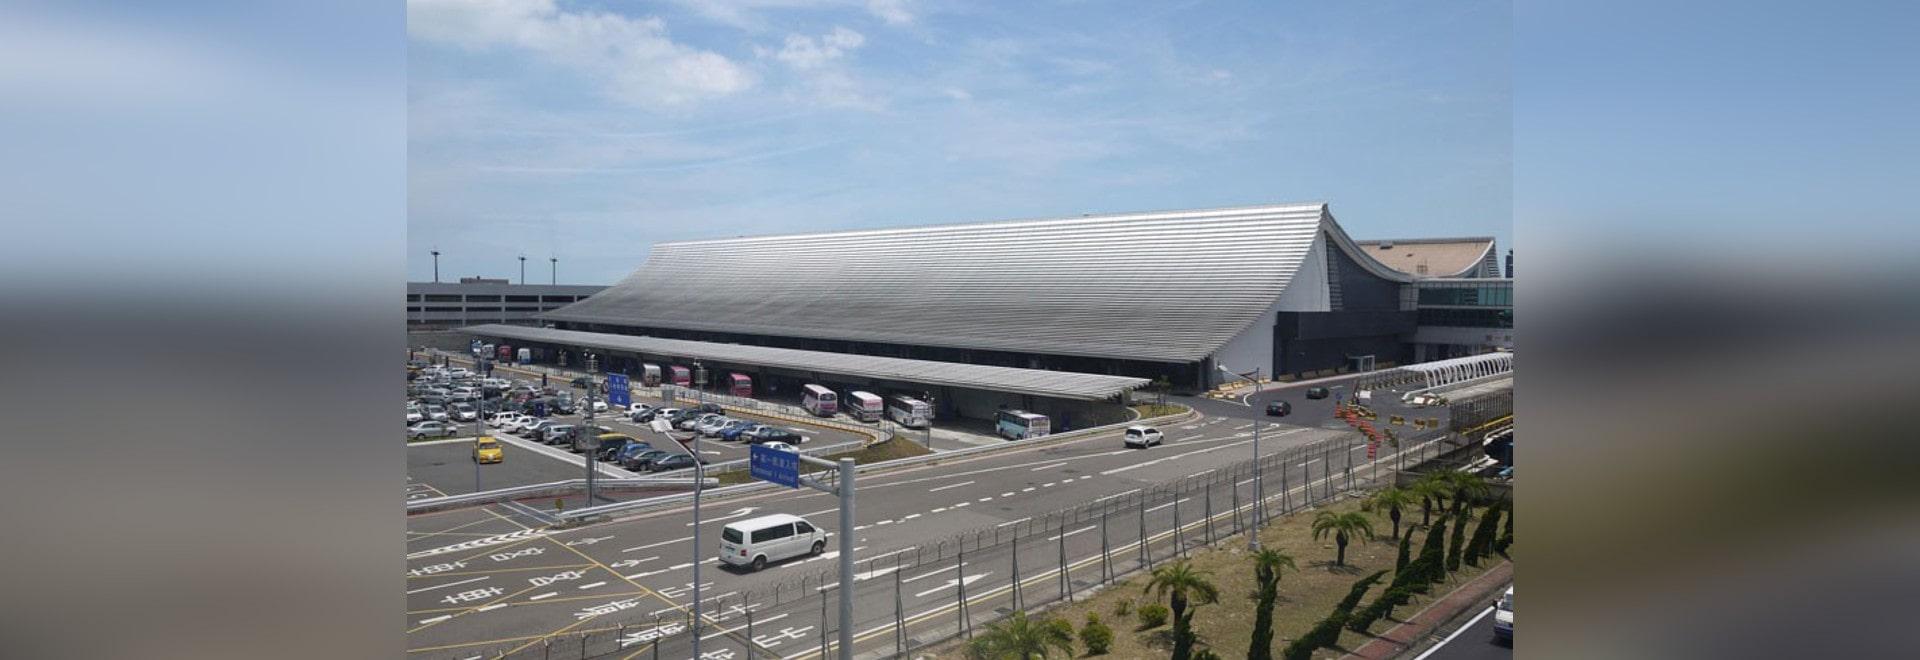 Sinuous Ascoli stadium unveiled by massimo guidotti architetto